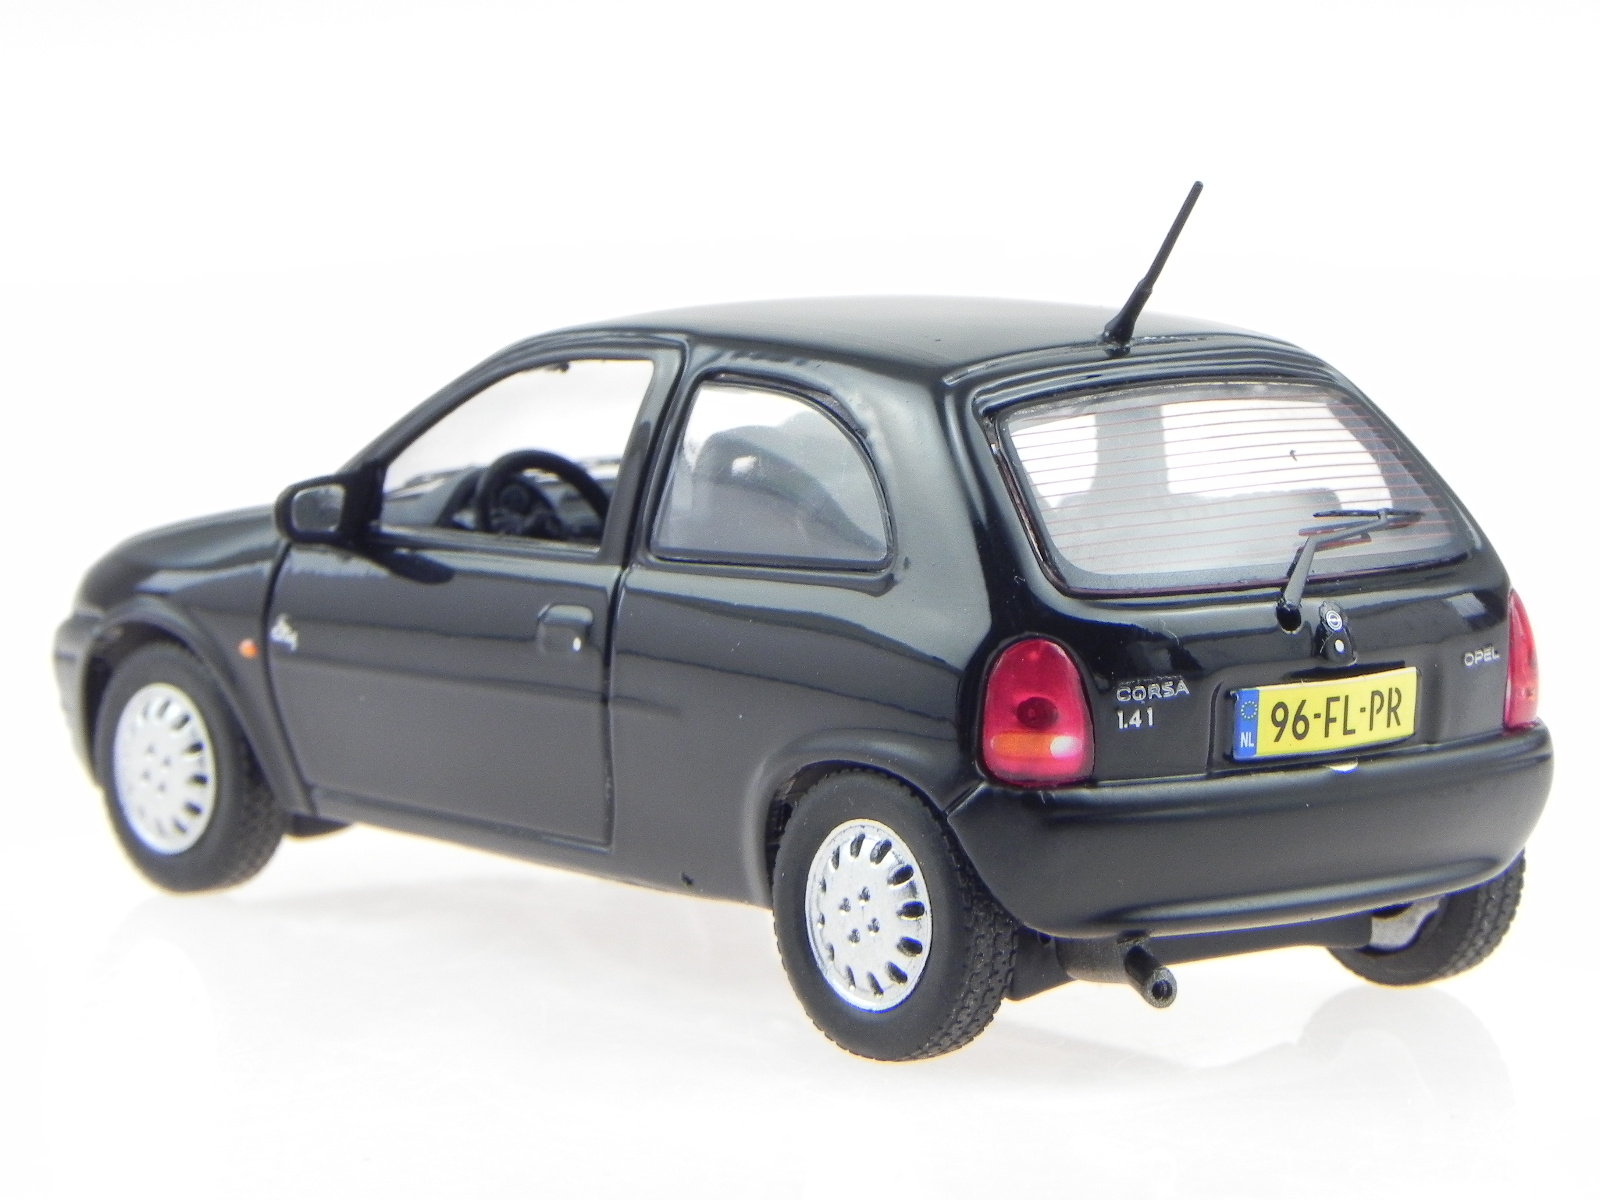 opel corsa b 1994 schwarz modellauto 43054 t9 1 43 eur. Black Bedroom Furniture Sets. Home Design Ideas